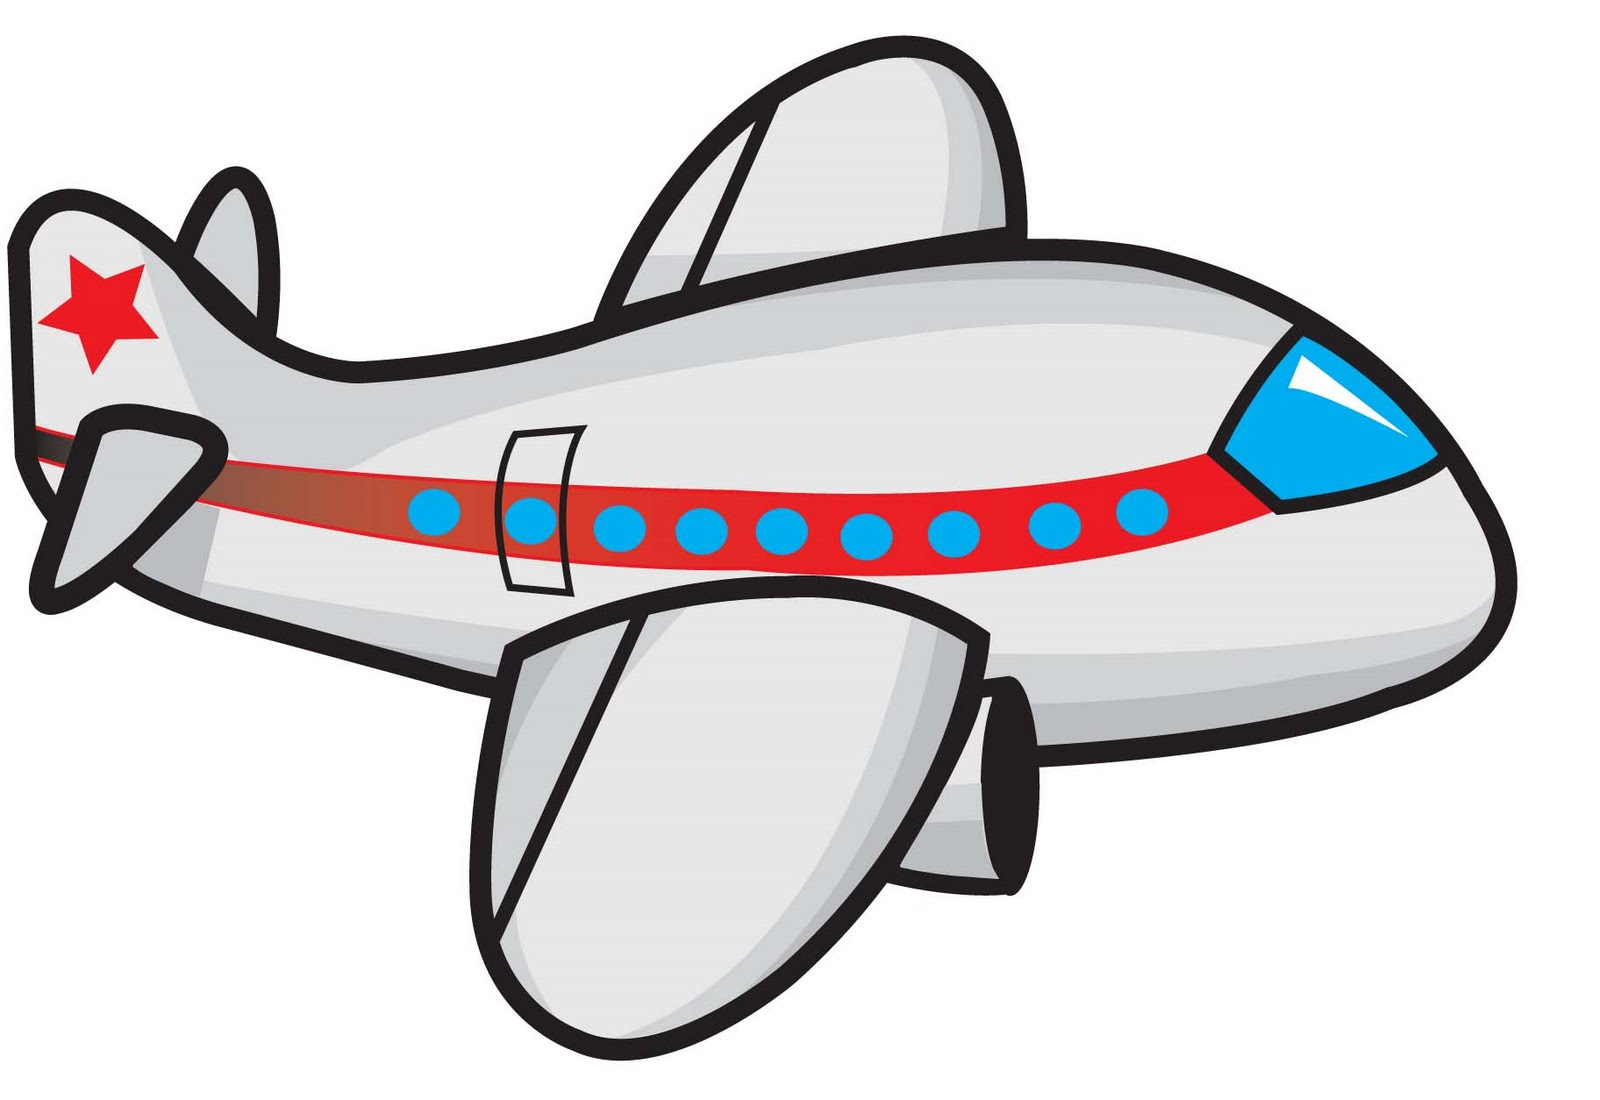 hight resolution of cartoon airplane clipart